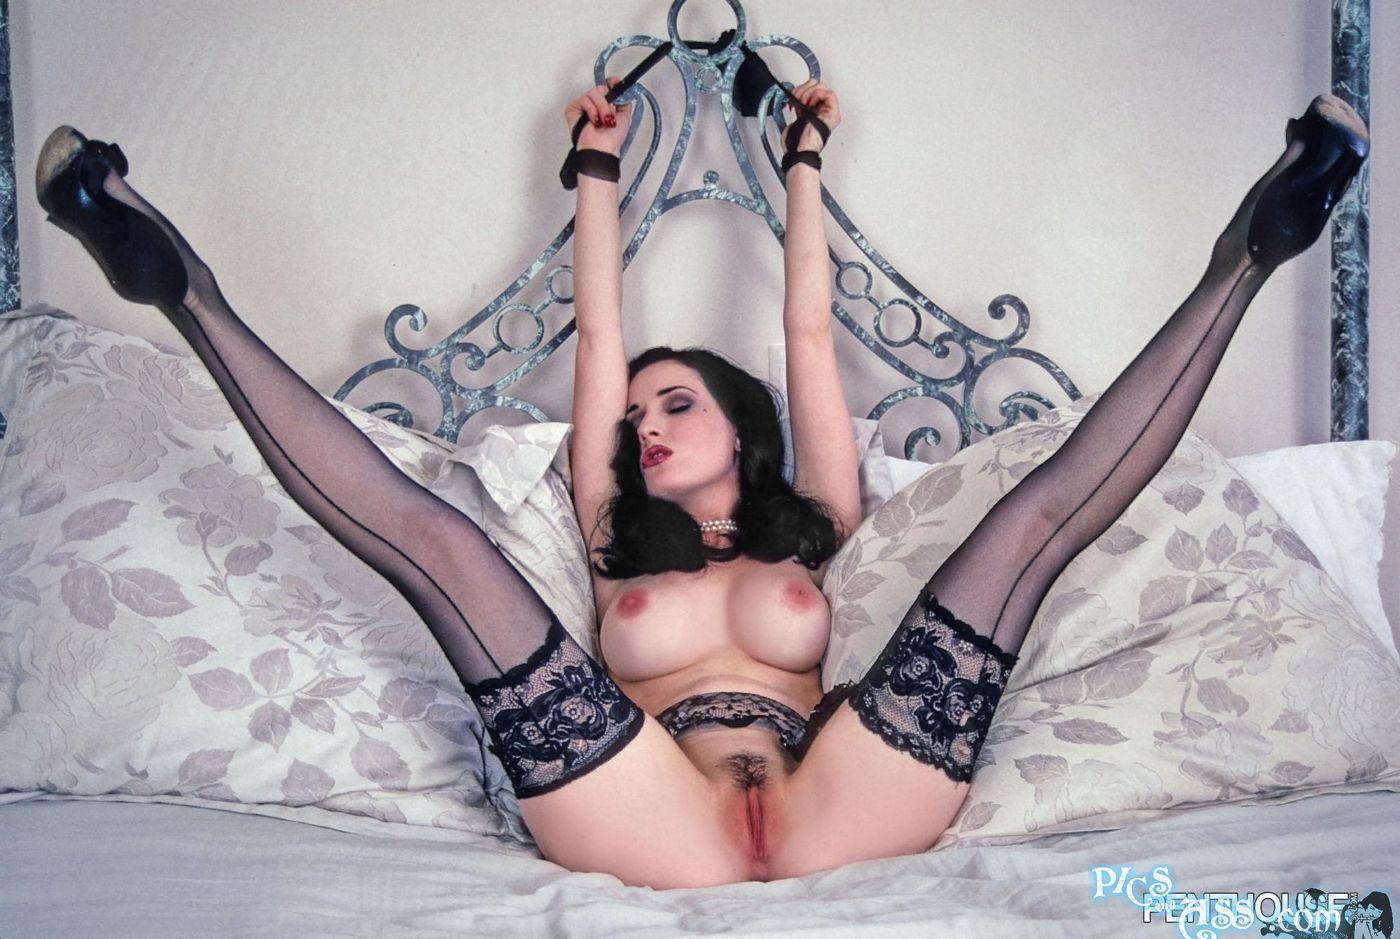 Dita von teese porn pics